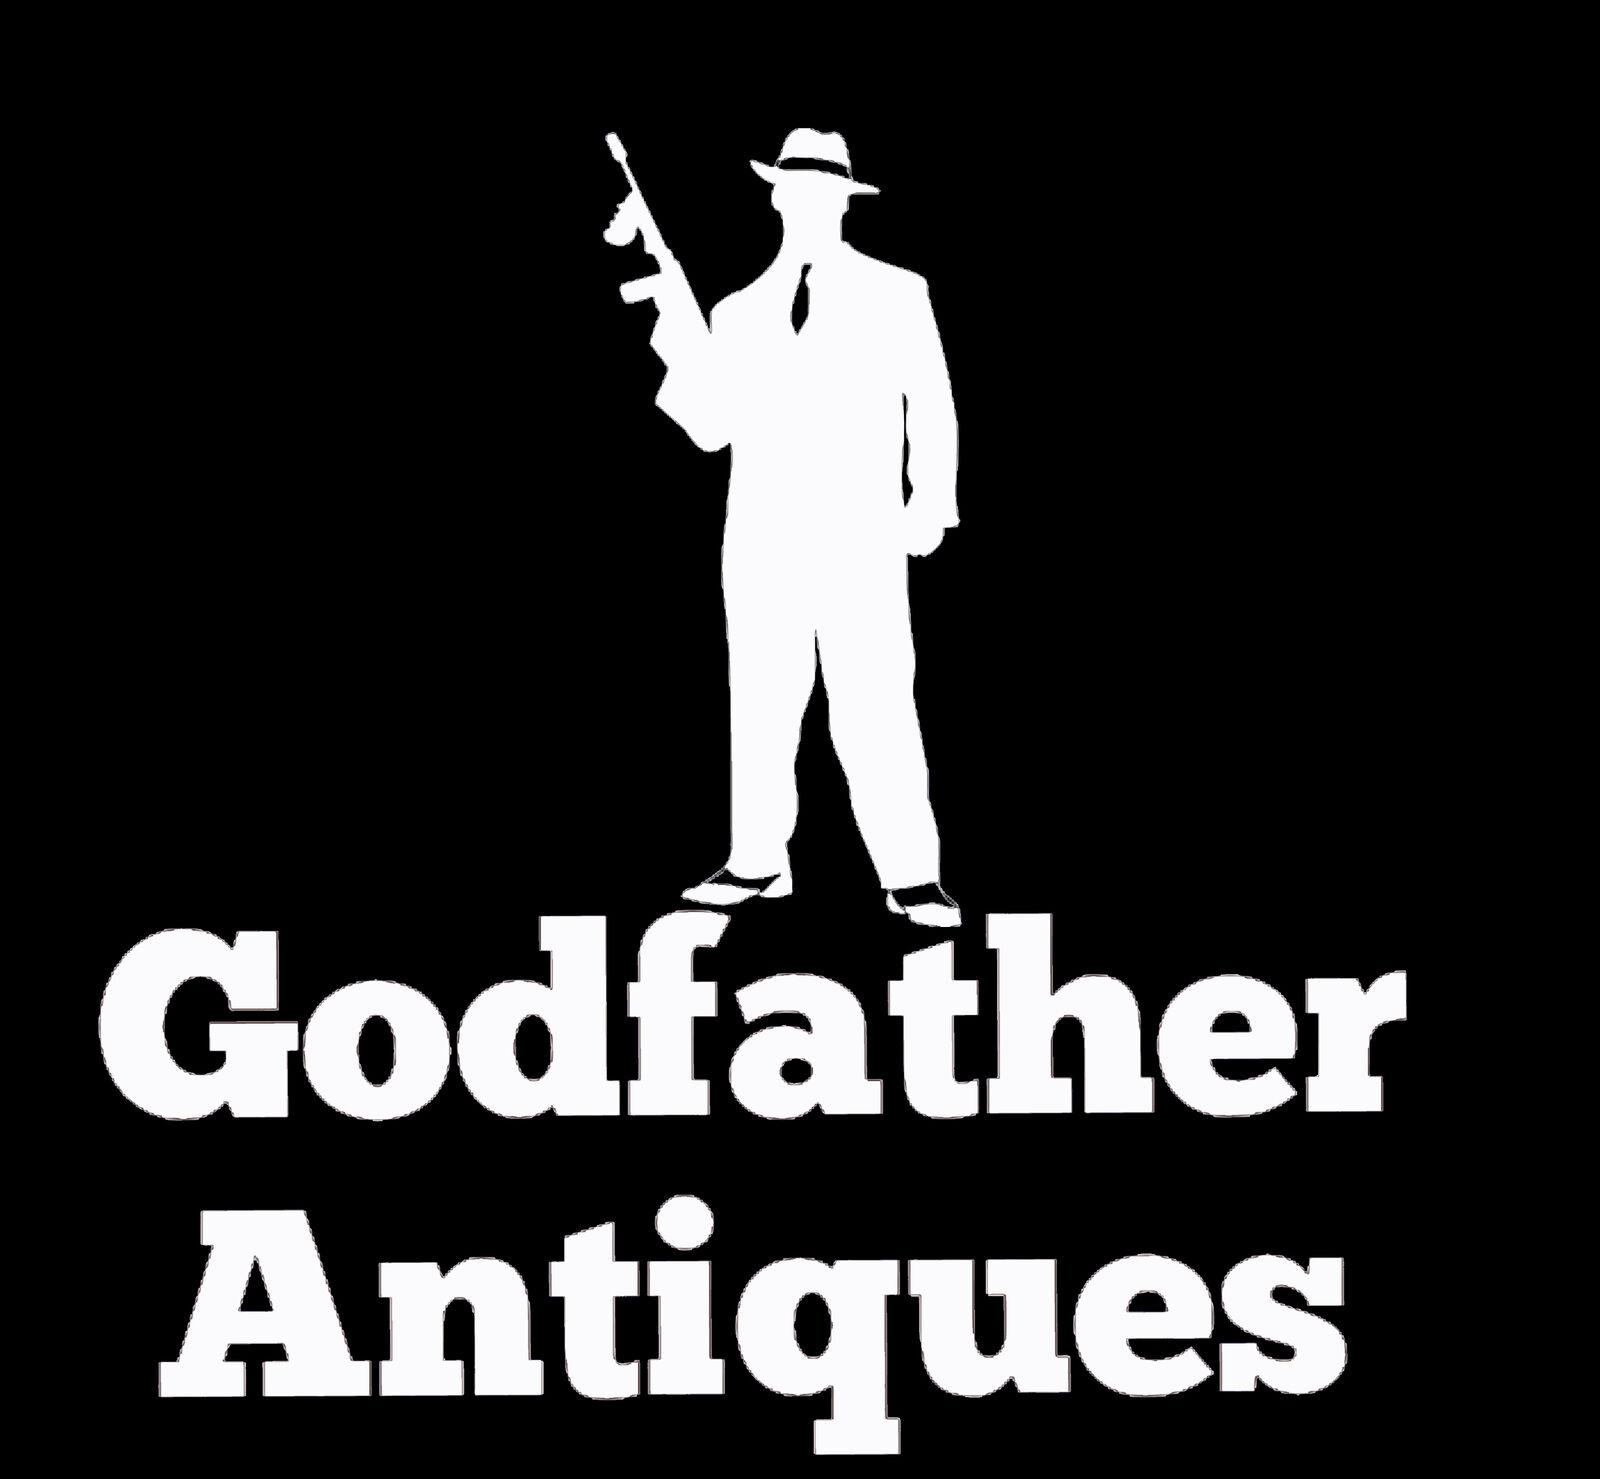 Godfather Antiques